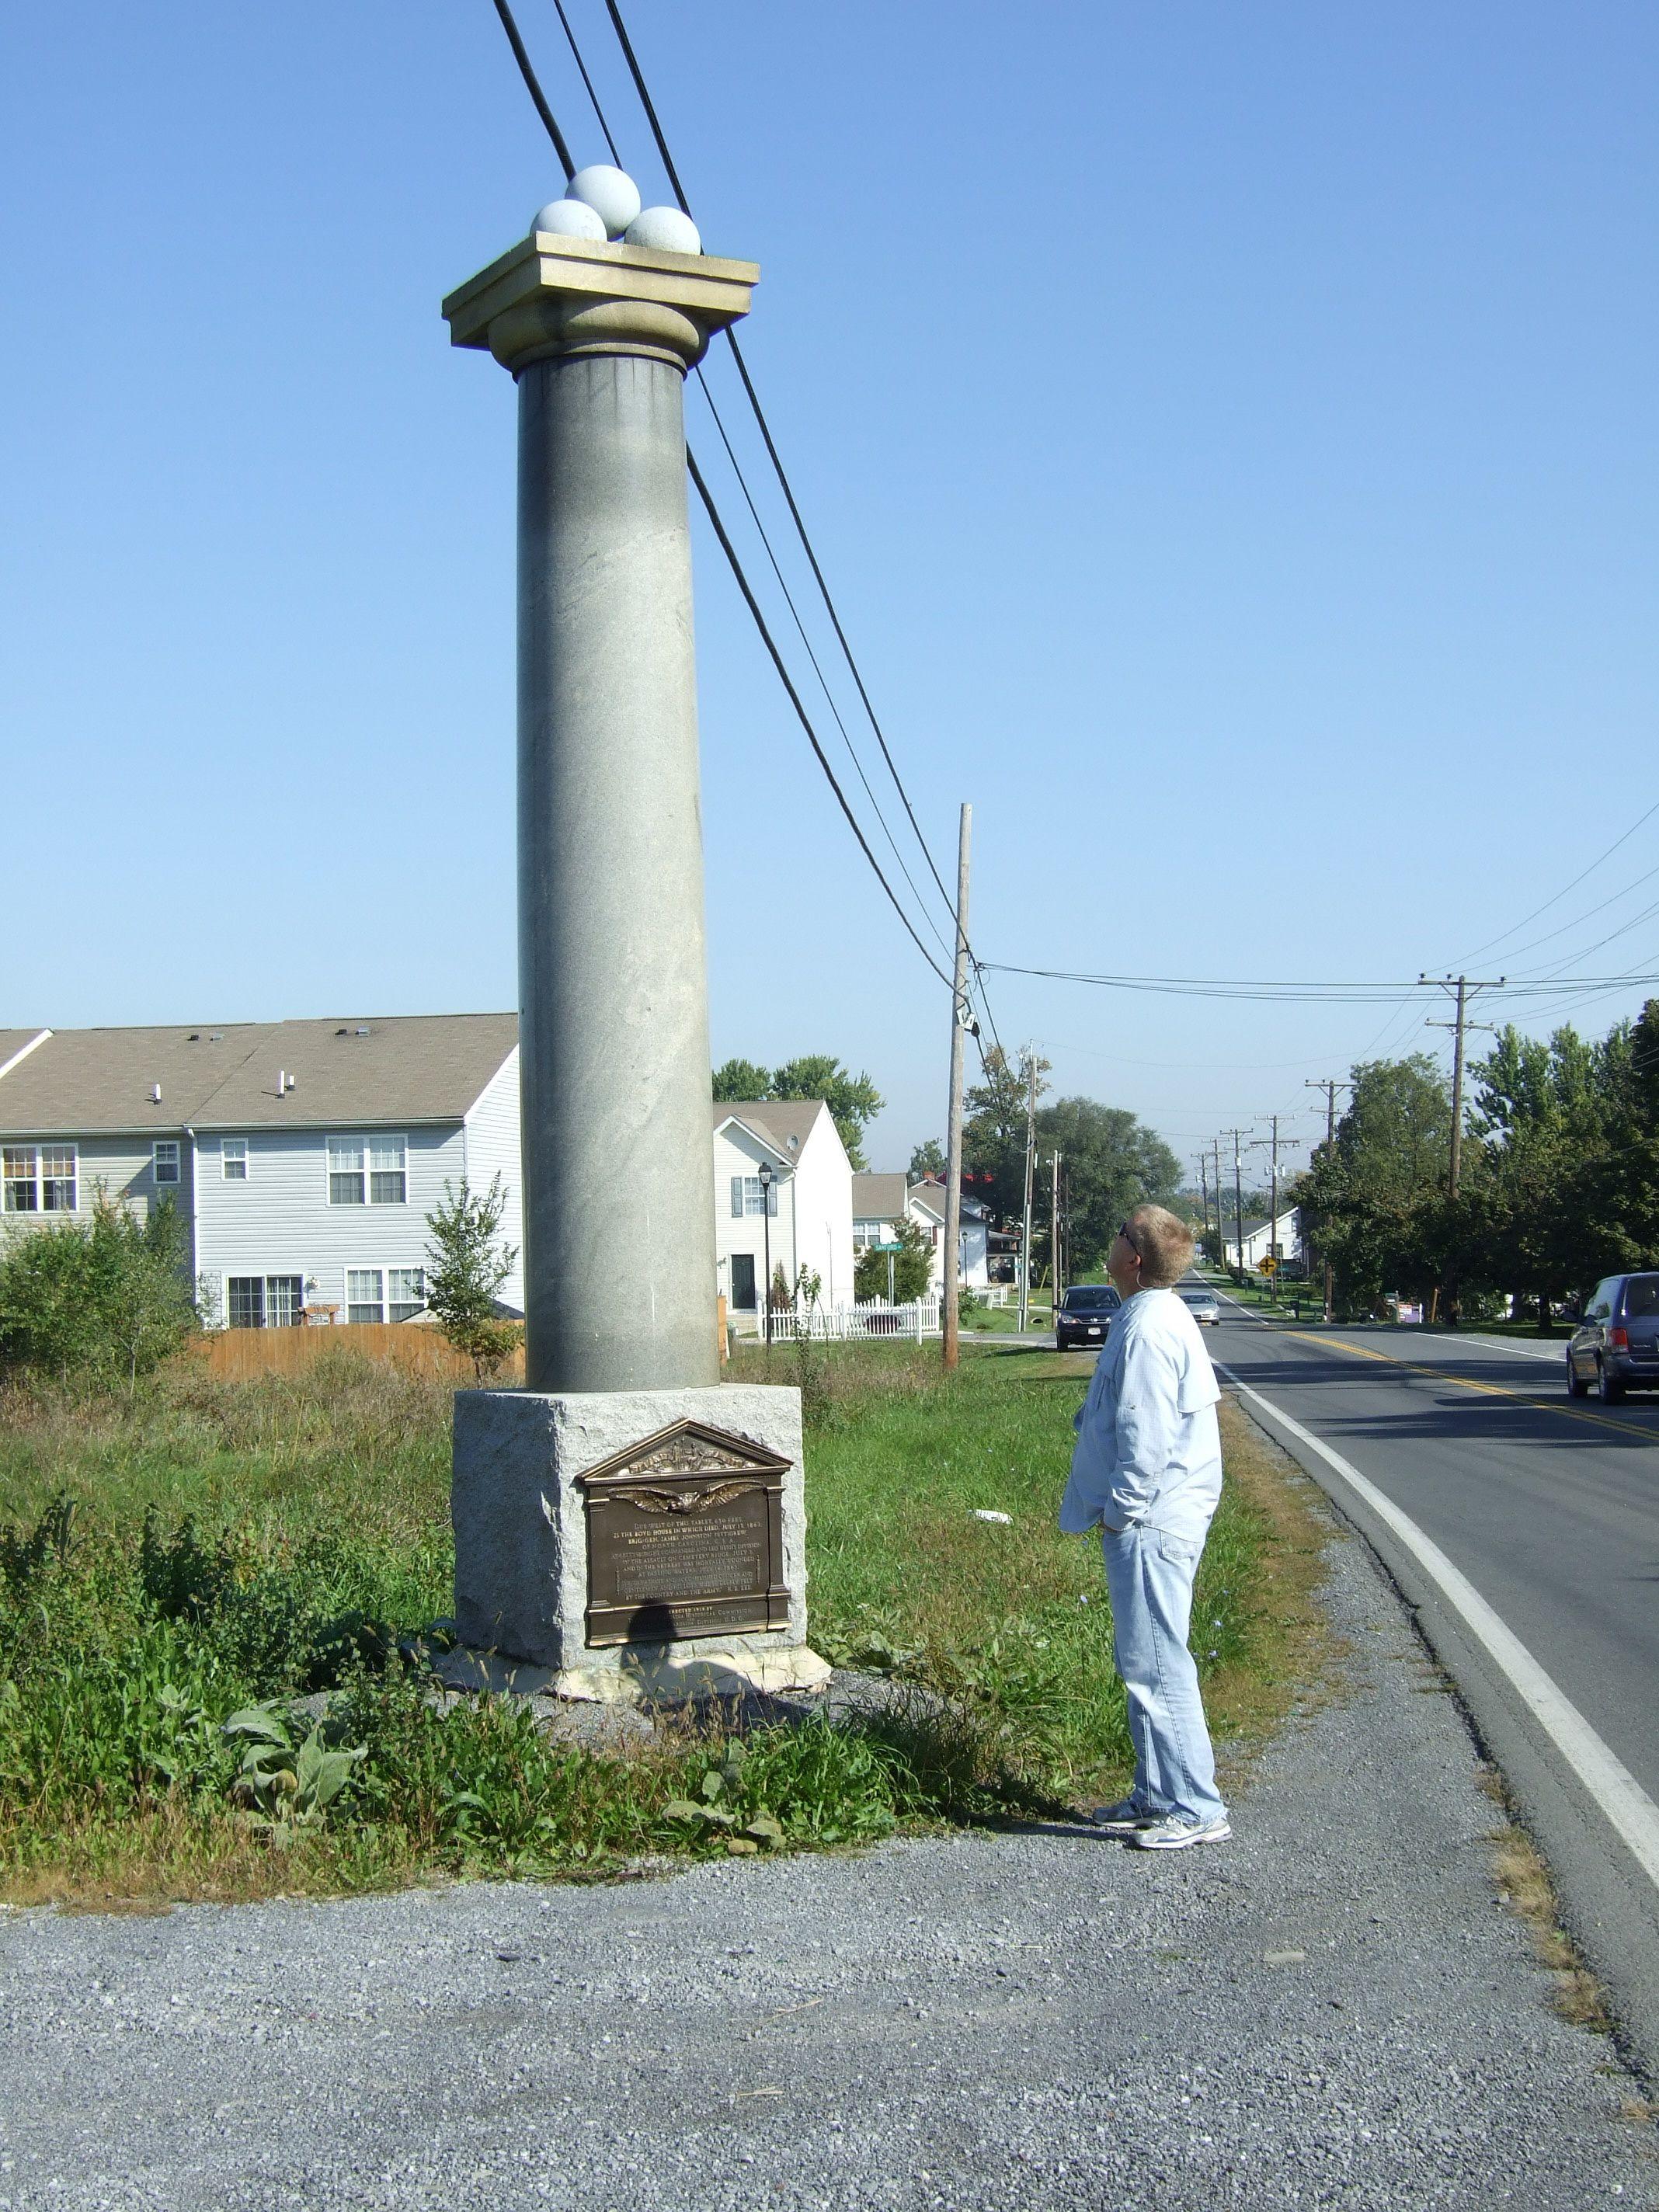 Bunker hill west virginia